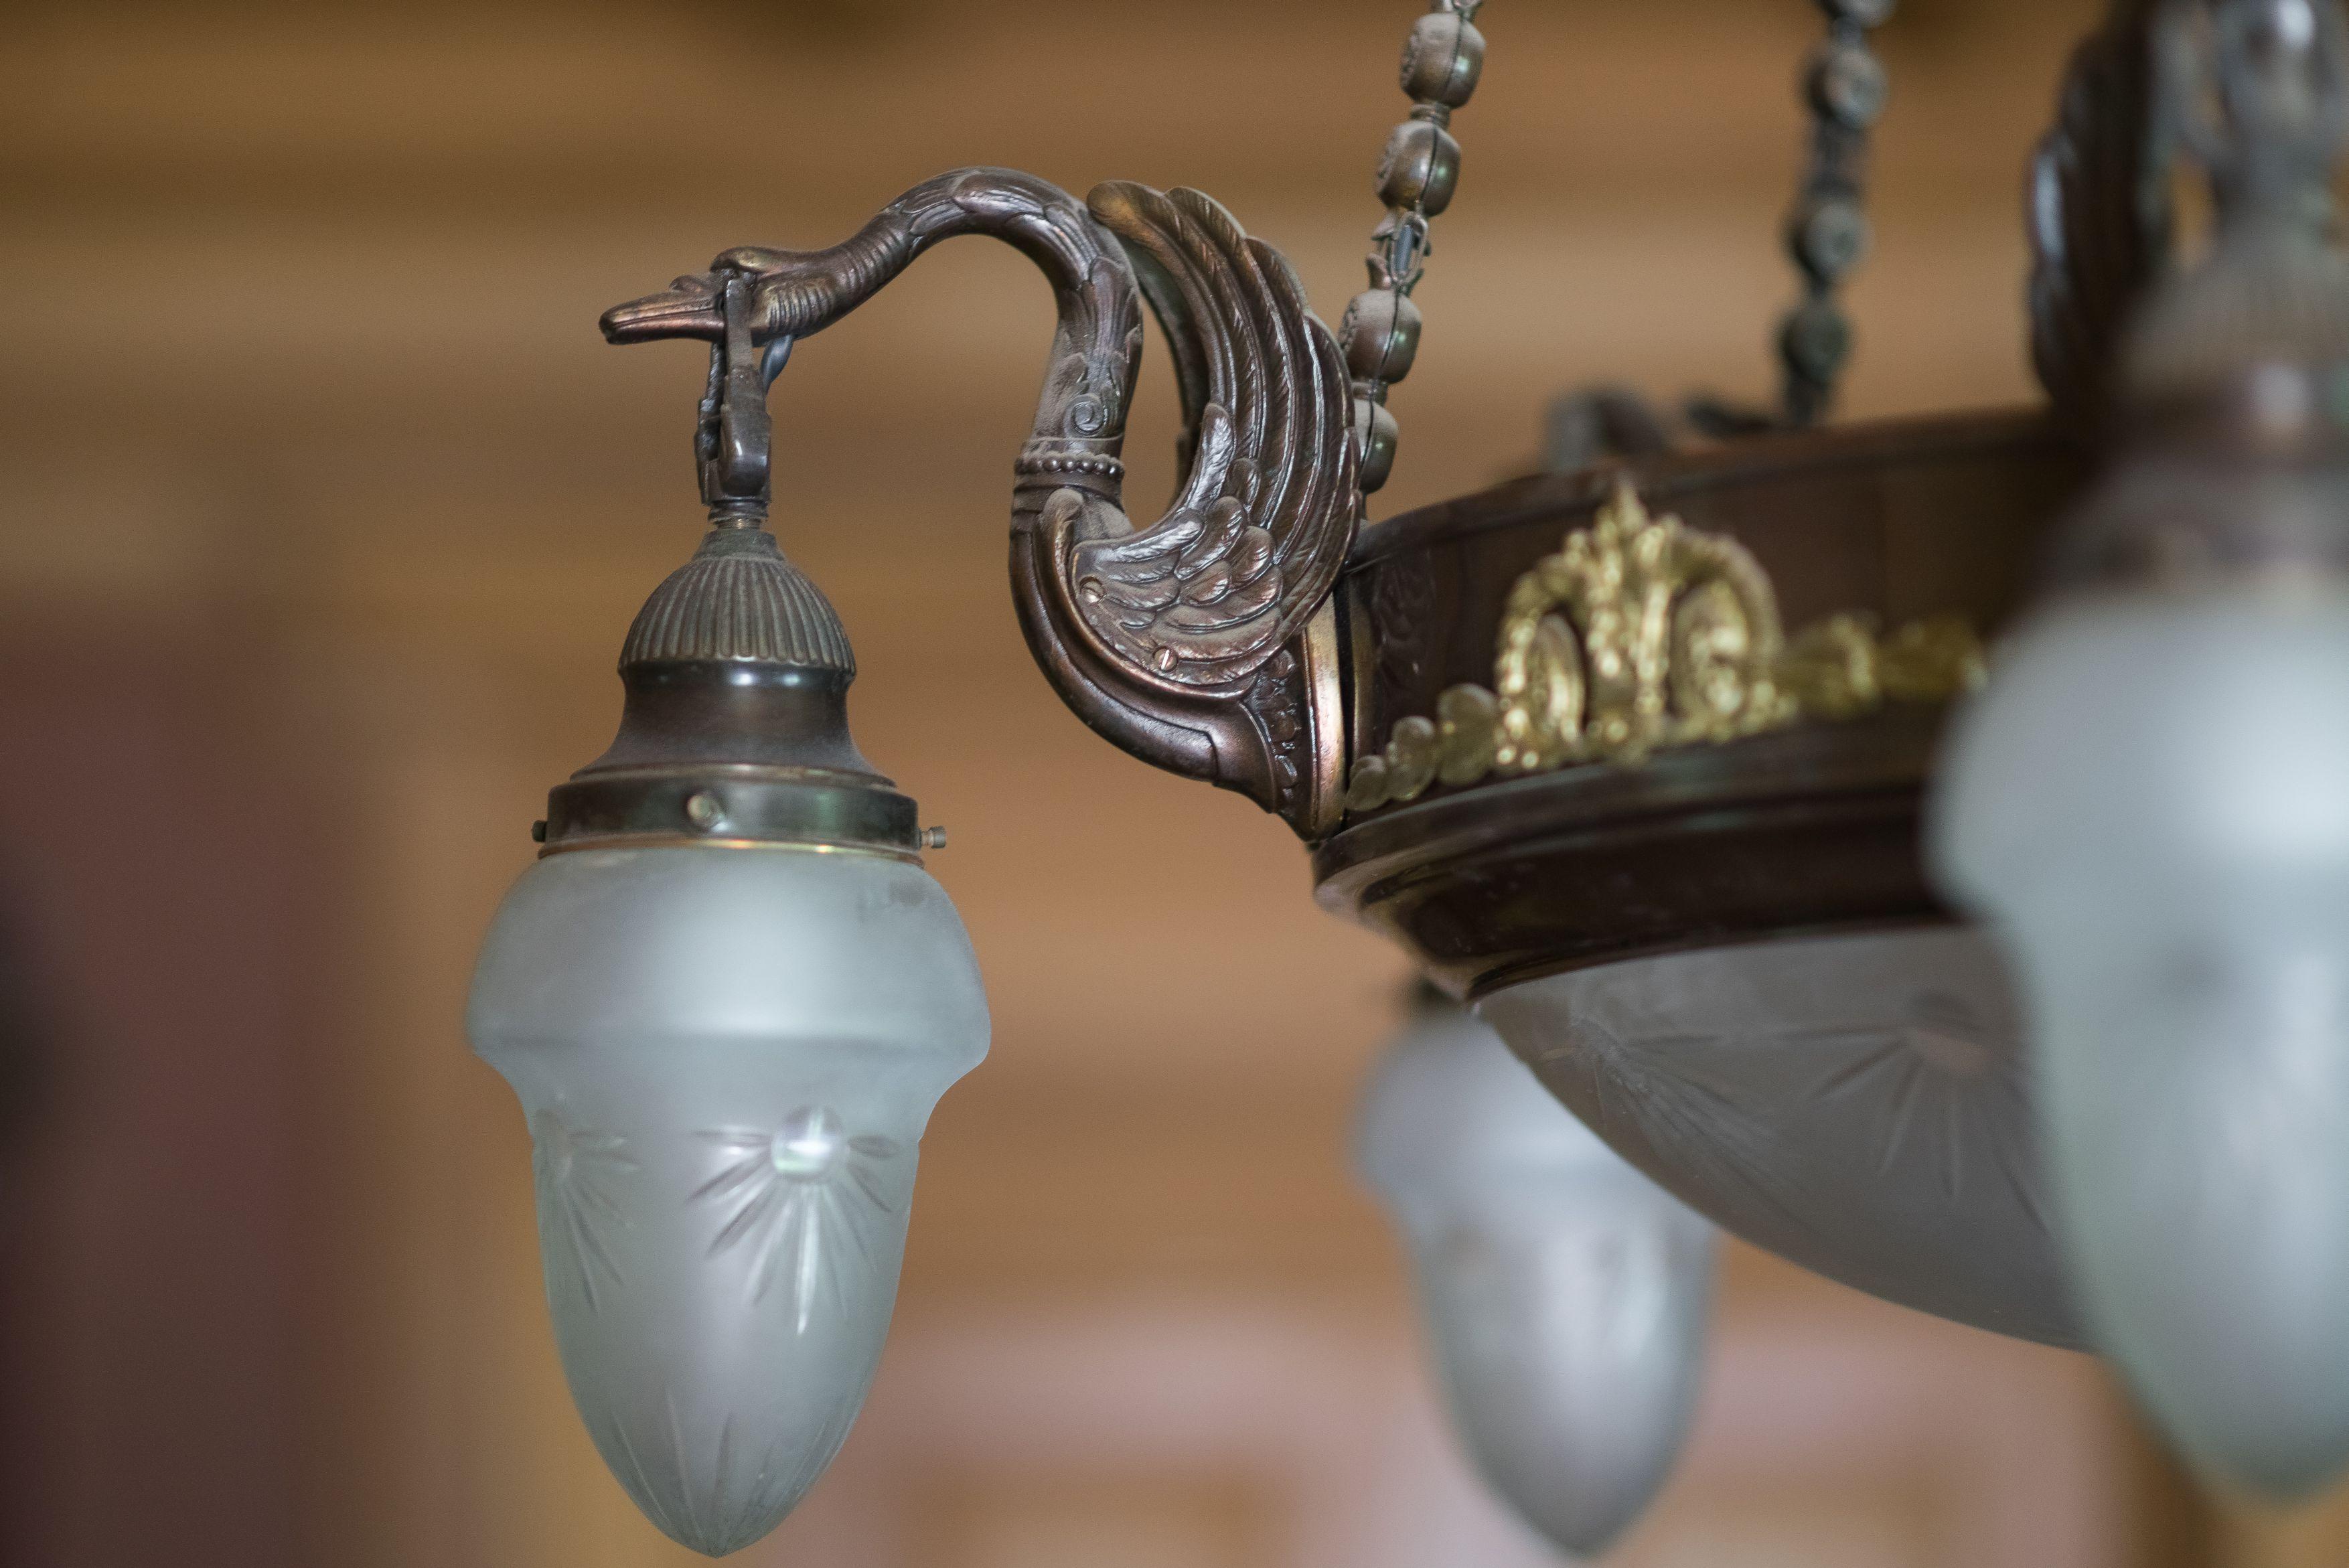 Fragment of chandelier, 1900–1906, P. Vileišis Palace. Photo by Povilas Jarmala, 2017